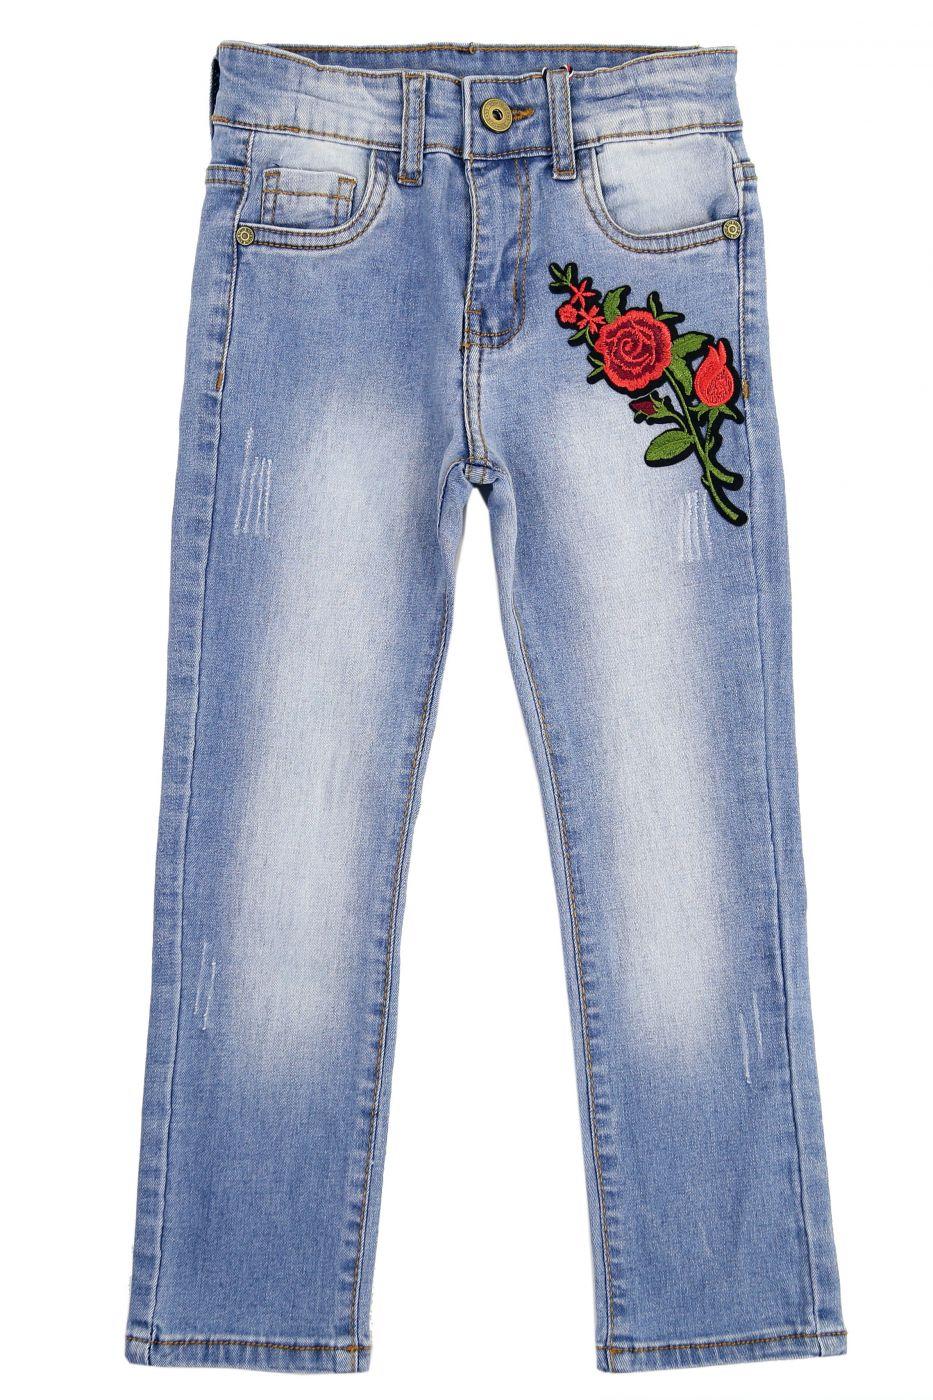 "Брюки джинсовые Bonito Jeans ""Roses"""